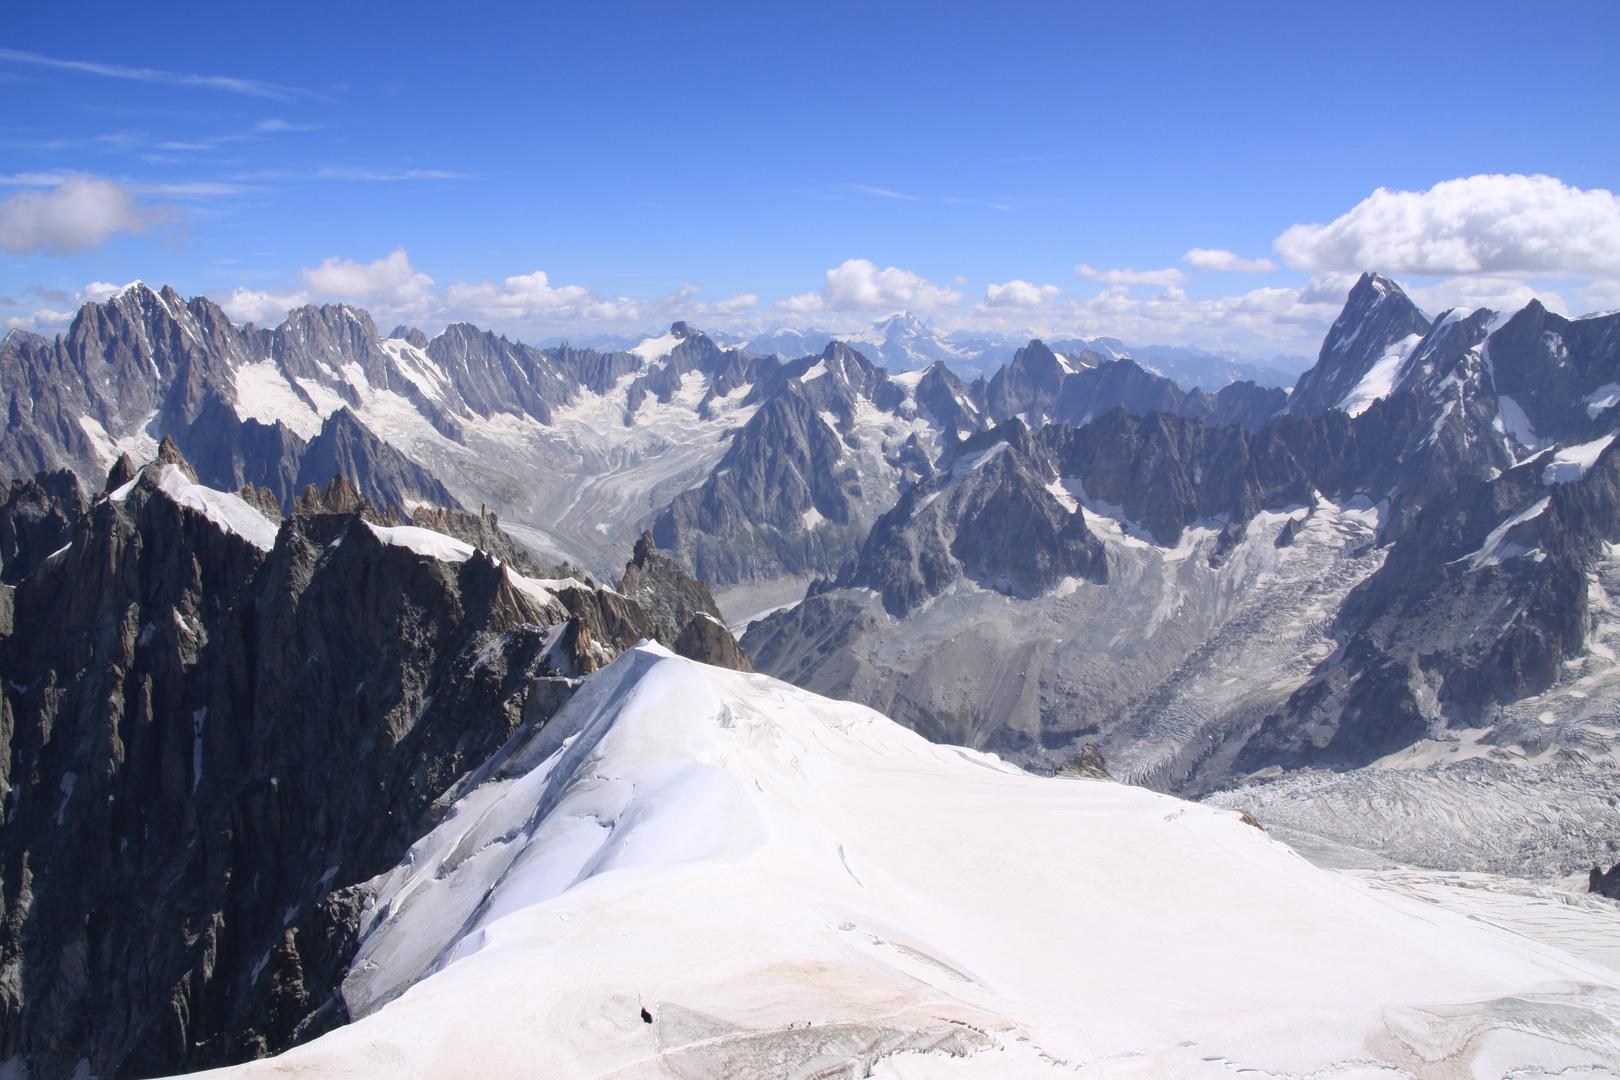 Los Alpes vistos desde Chamonix Mont Blanc